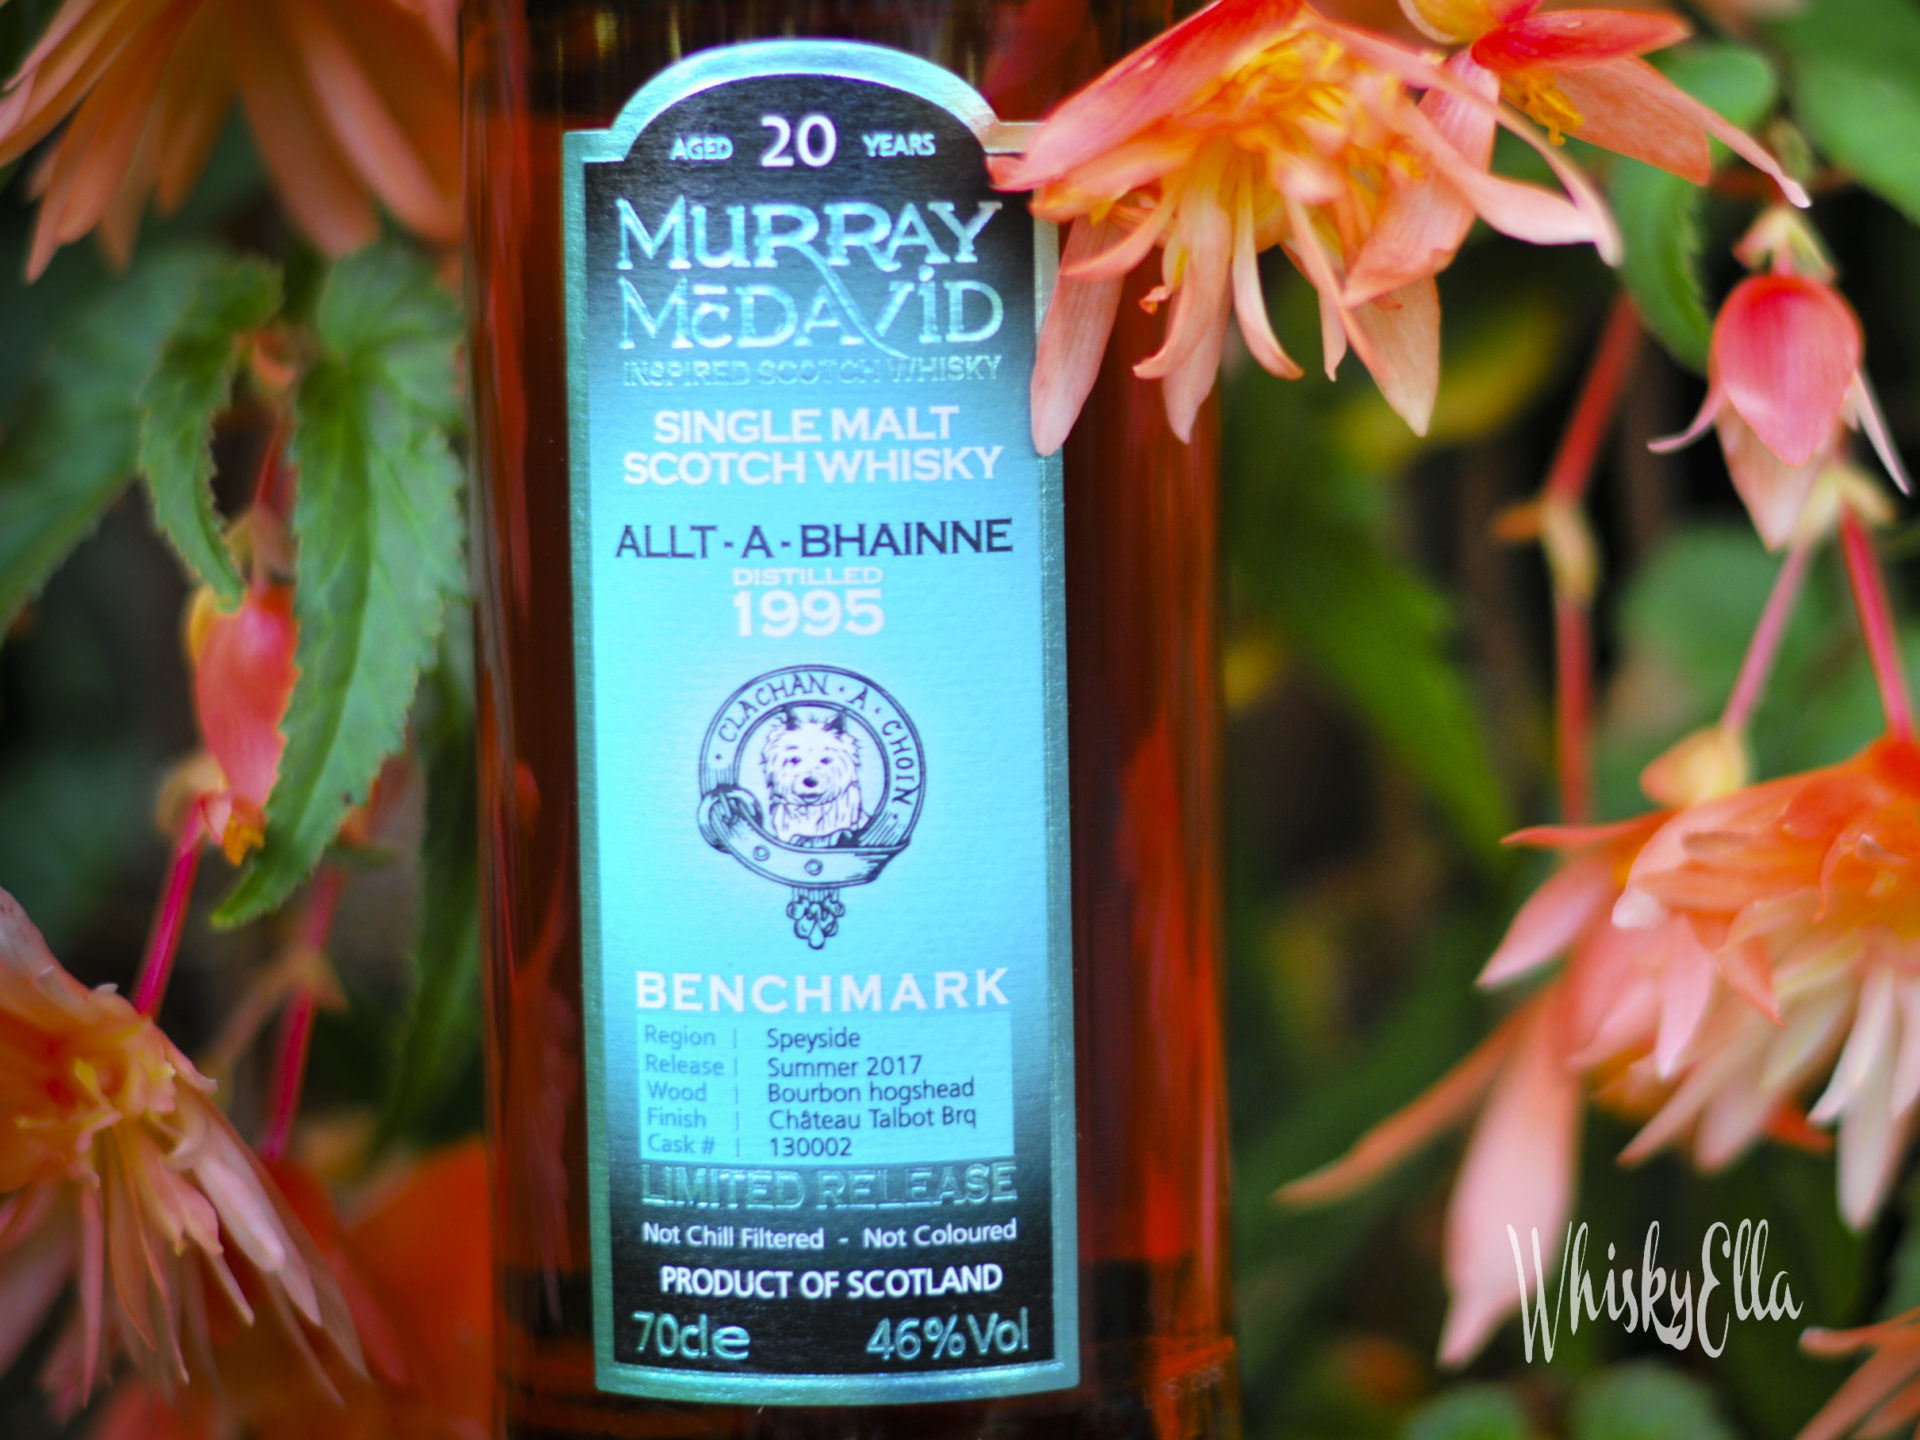 Nasza recenzja Allt-A-Bhainne 1995 20 yo, Murray McDavid #39